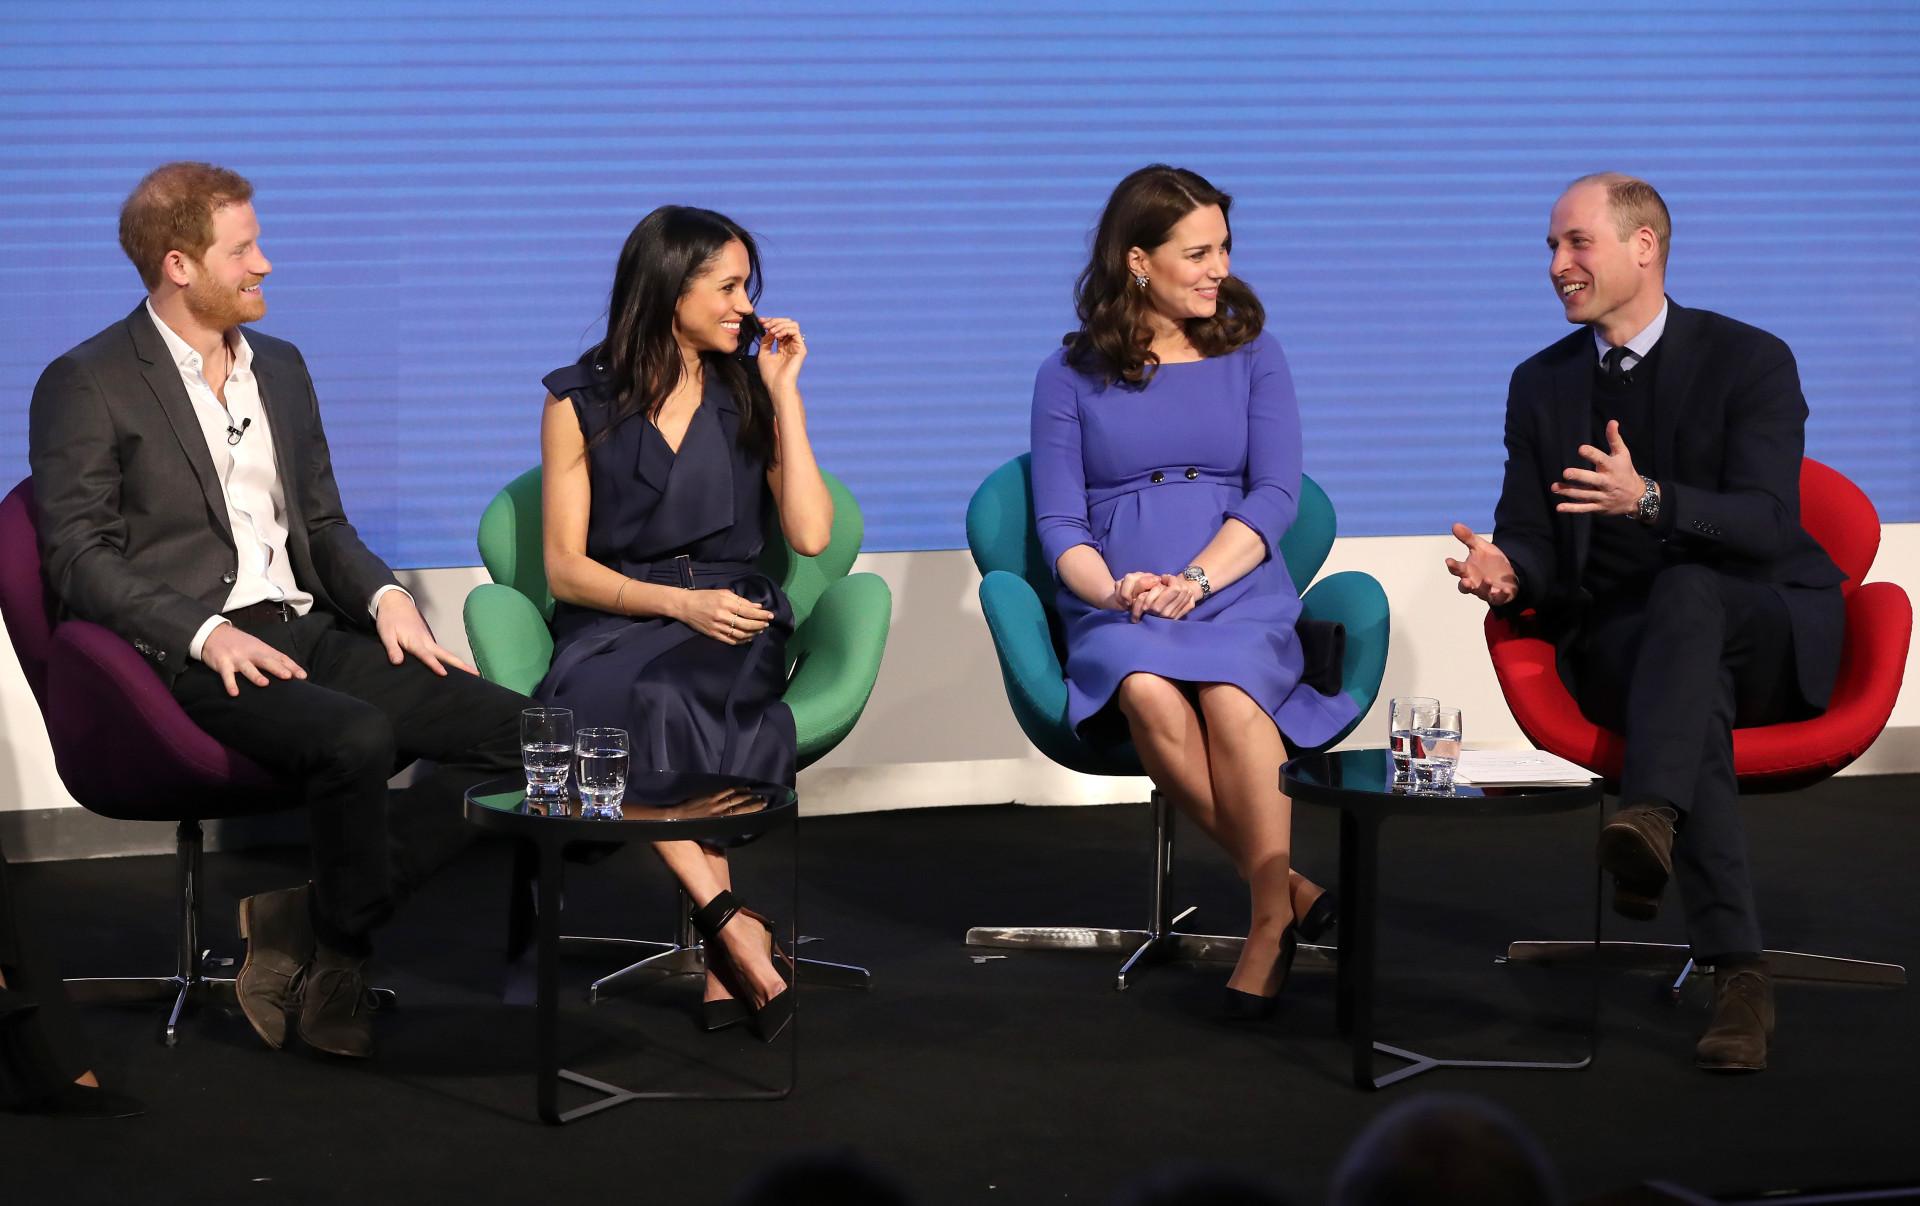 Quinze regras que Meghan Markle terá de seguir na família real britânica